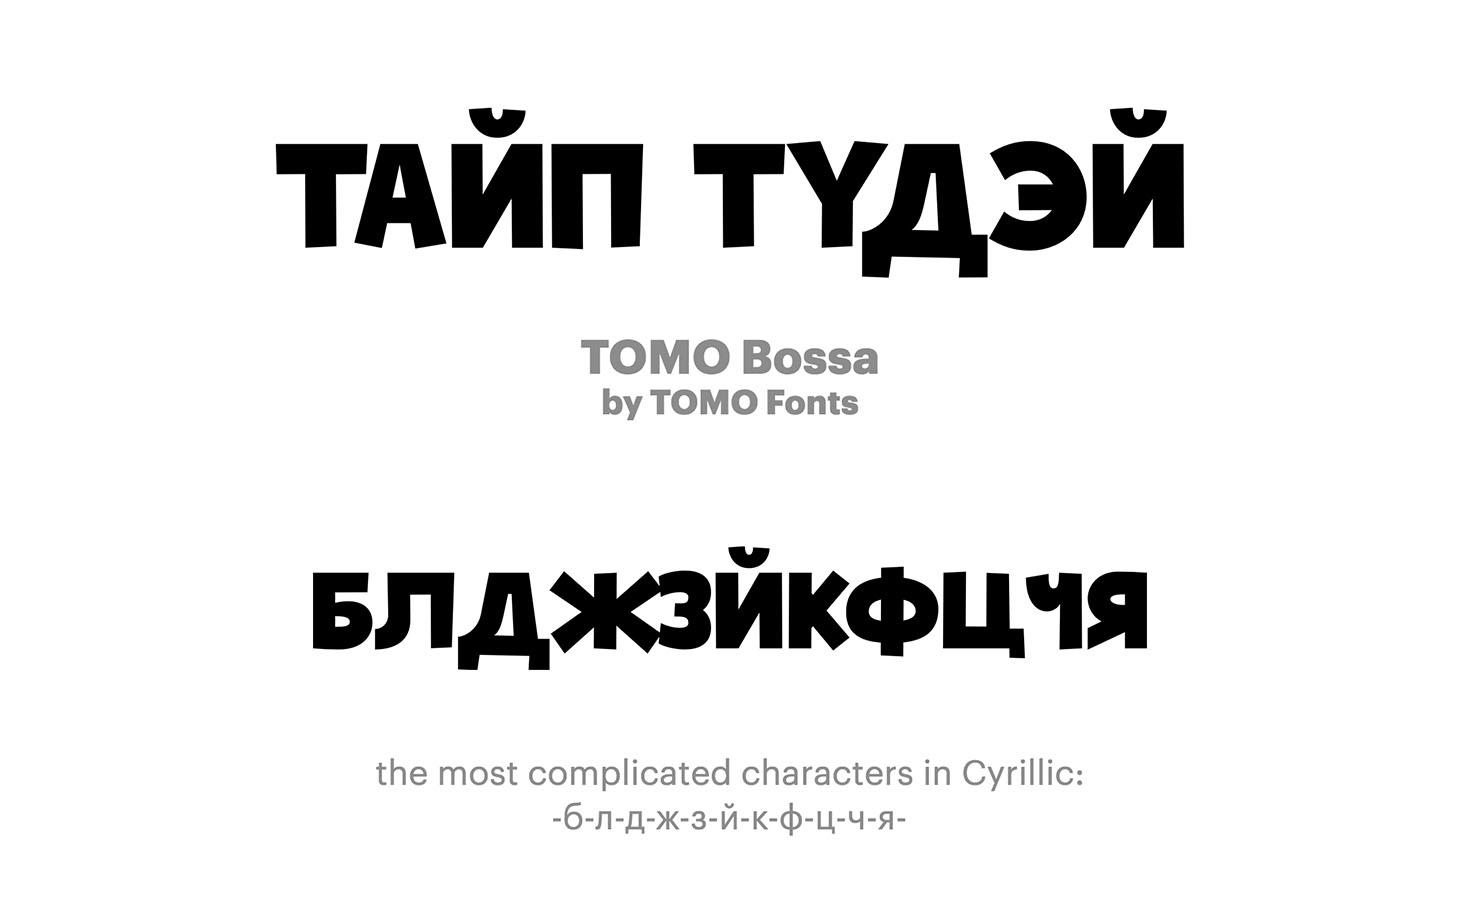 TOMO-Bossa